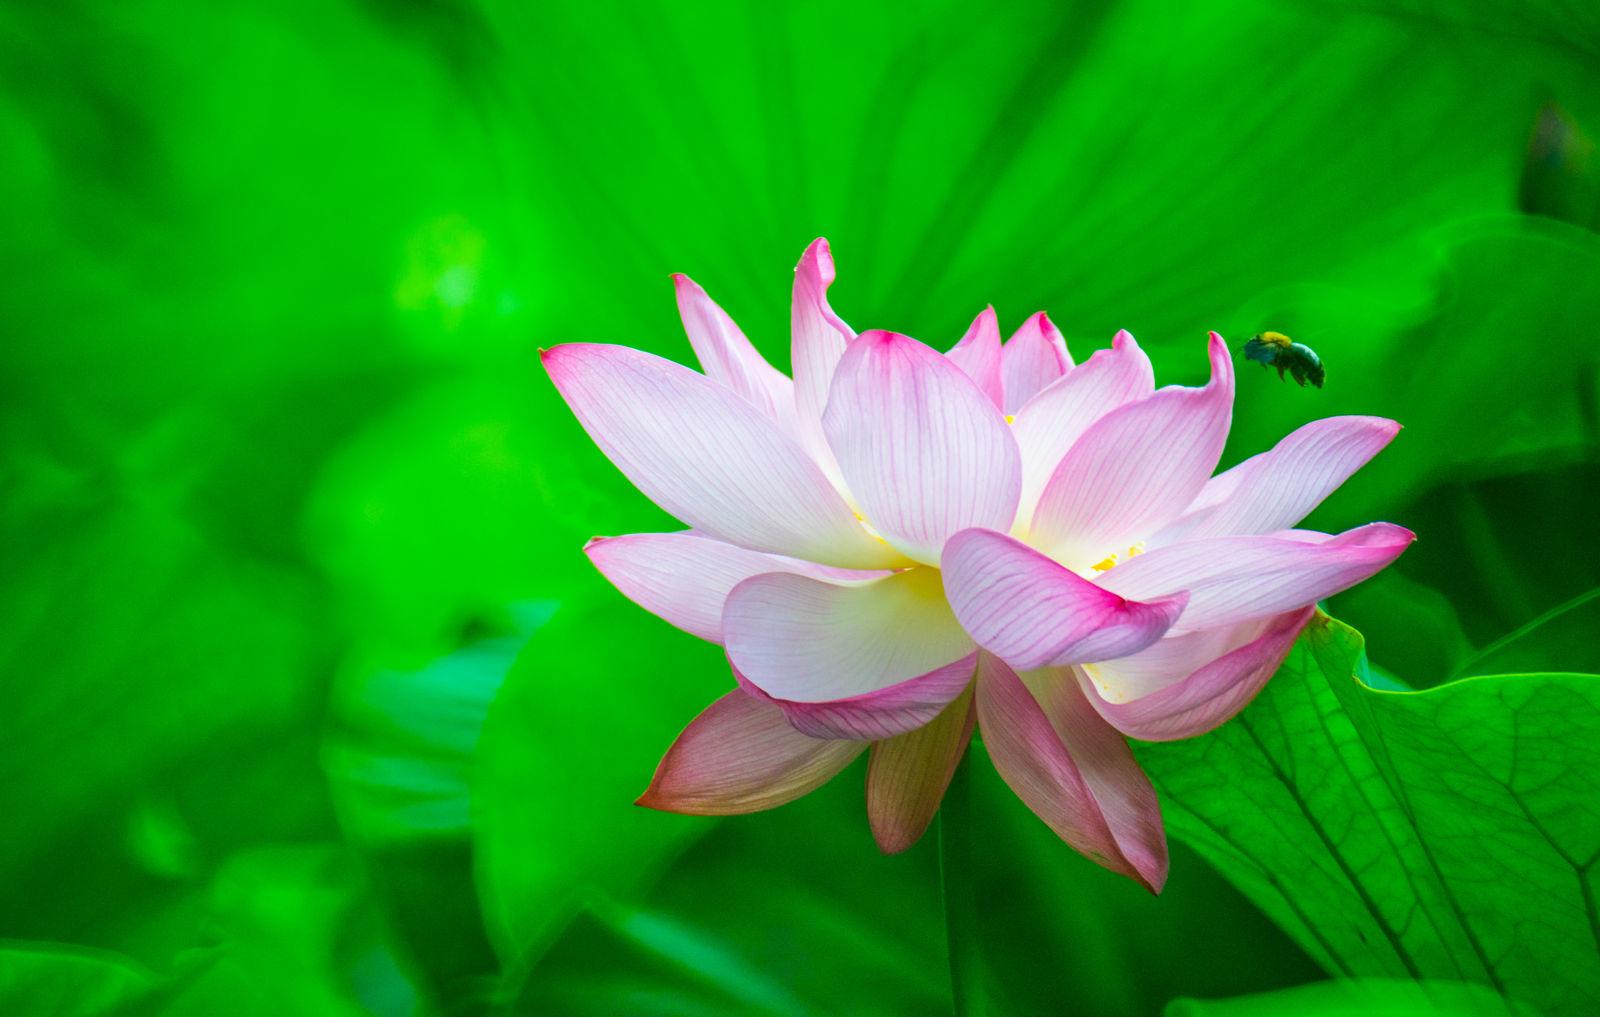 40 beautiful flower wallpapers for your desktop hd lotus flower wallpaper hd by aotaro lotus flower wallpaper hd voltagebd Images